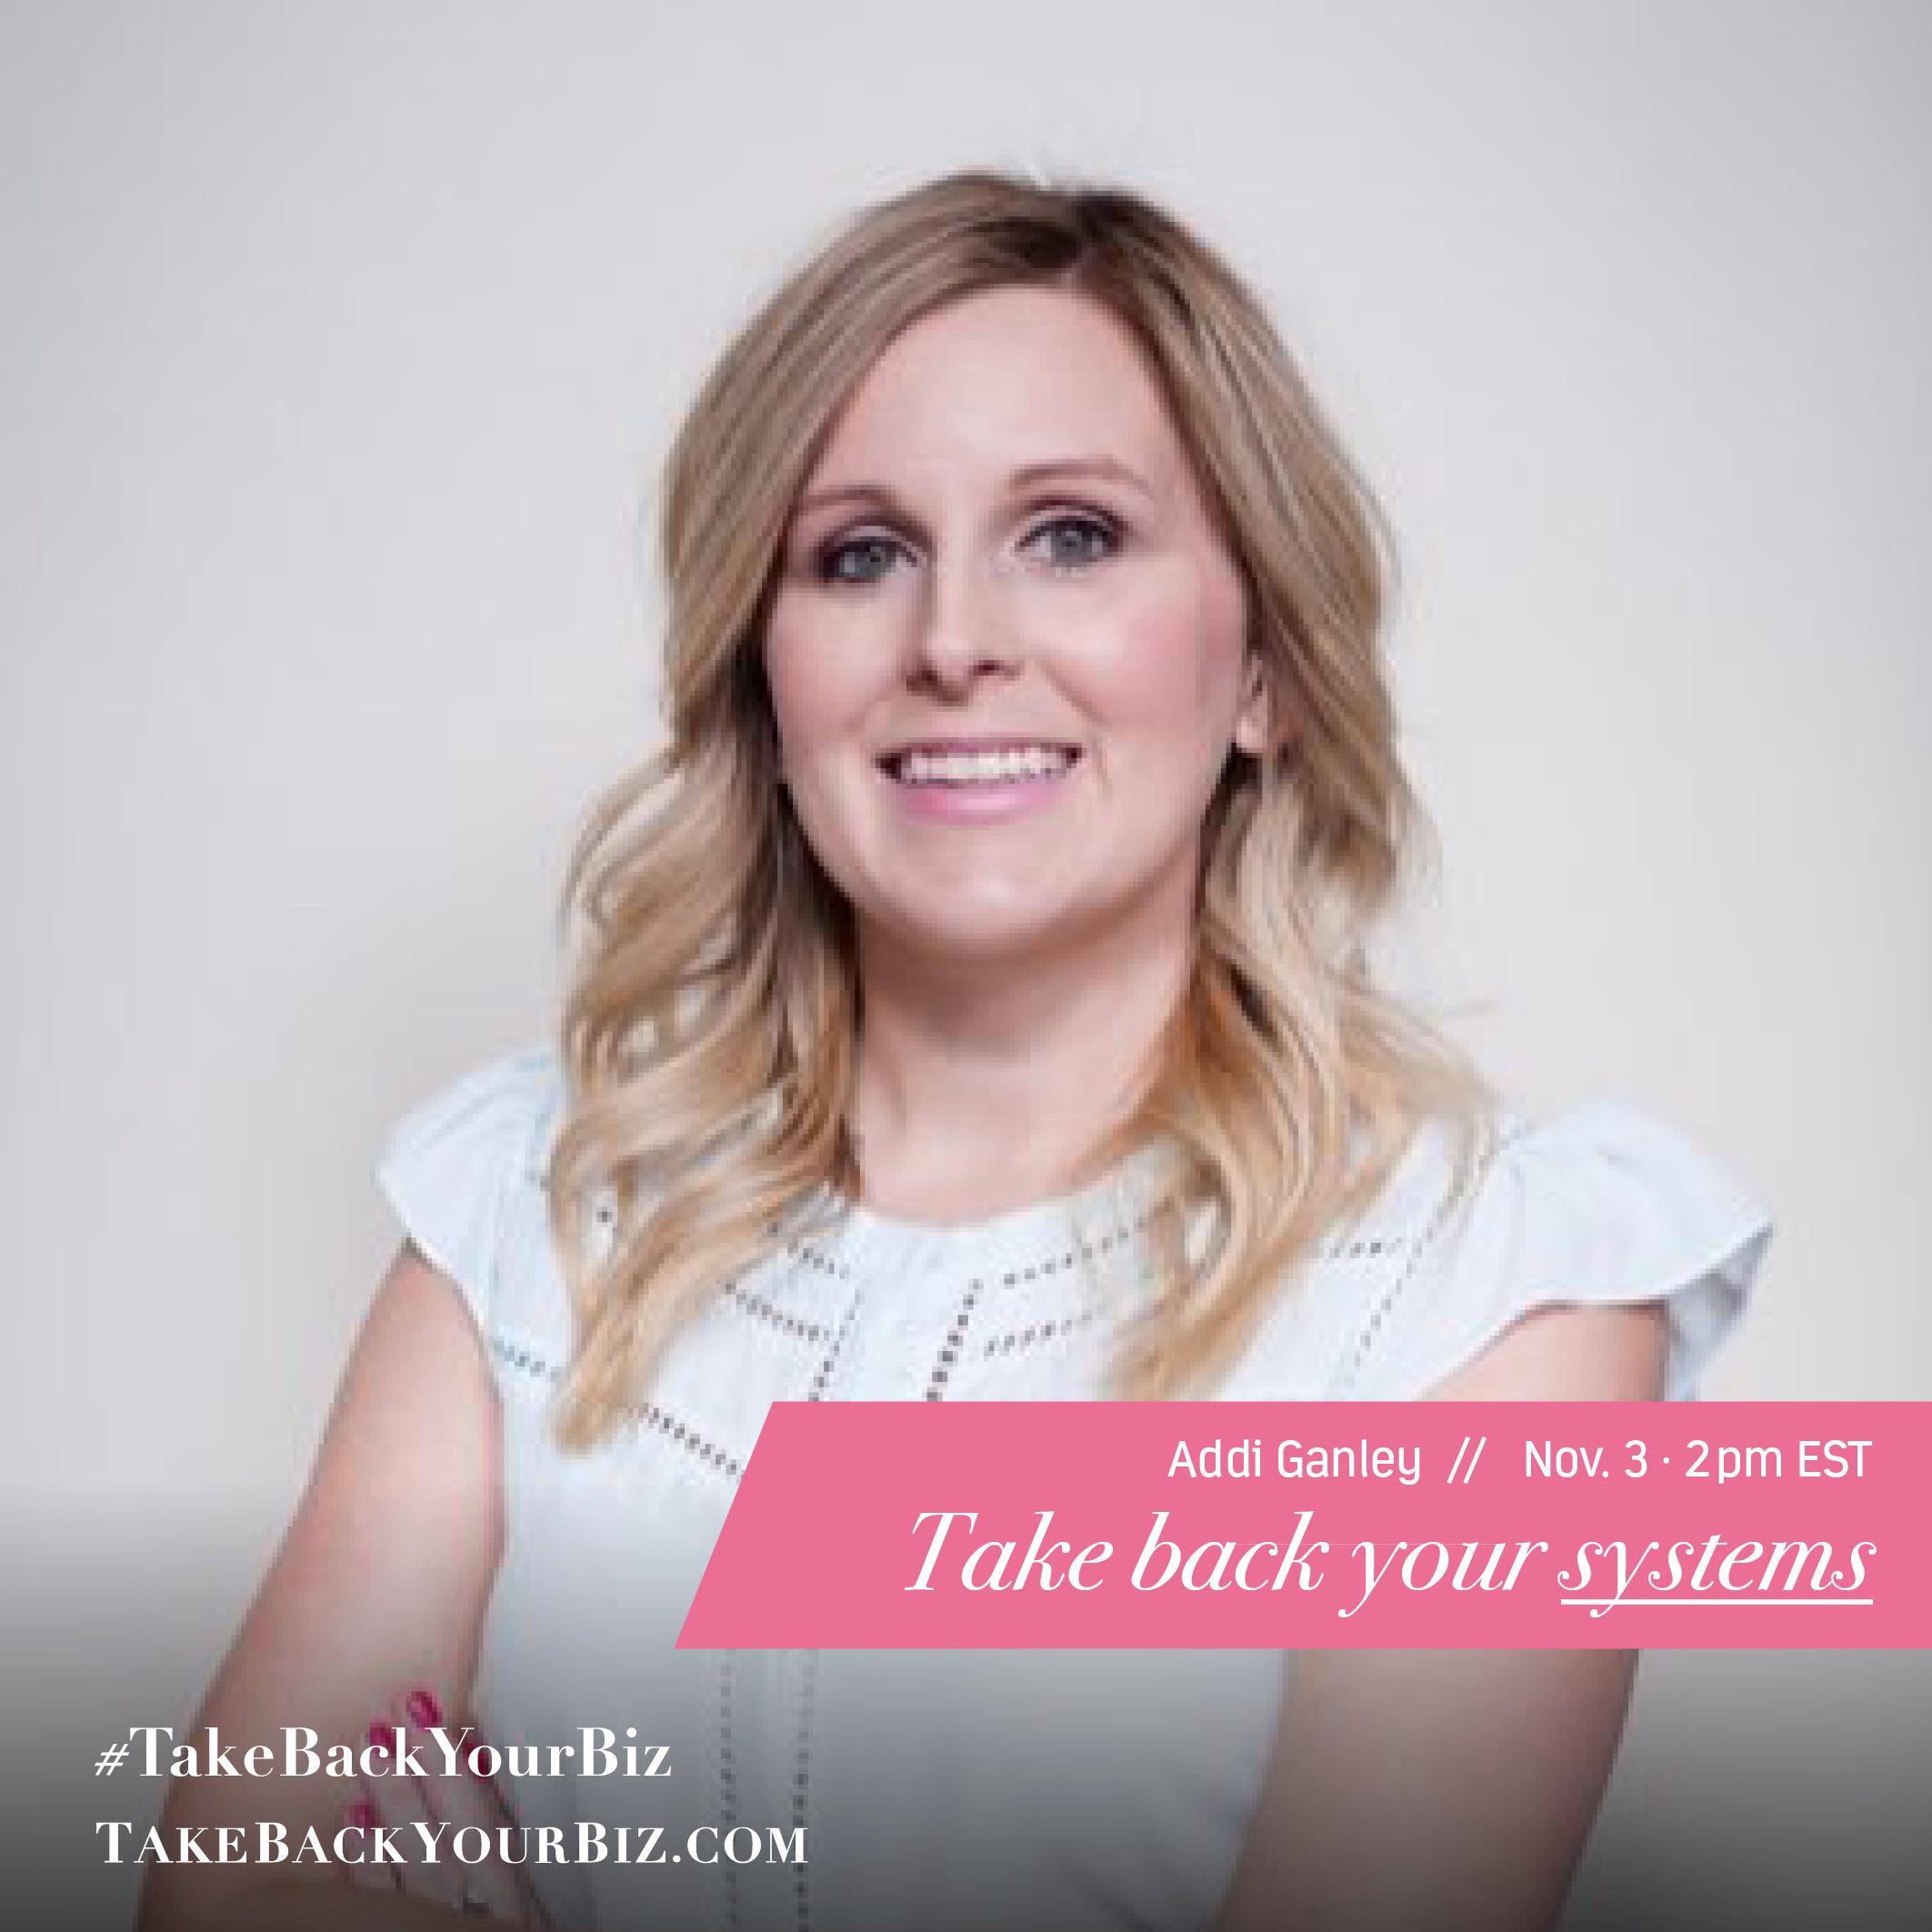 Take-Back-Your-Biz-Speakers-Addi-Ganley